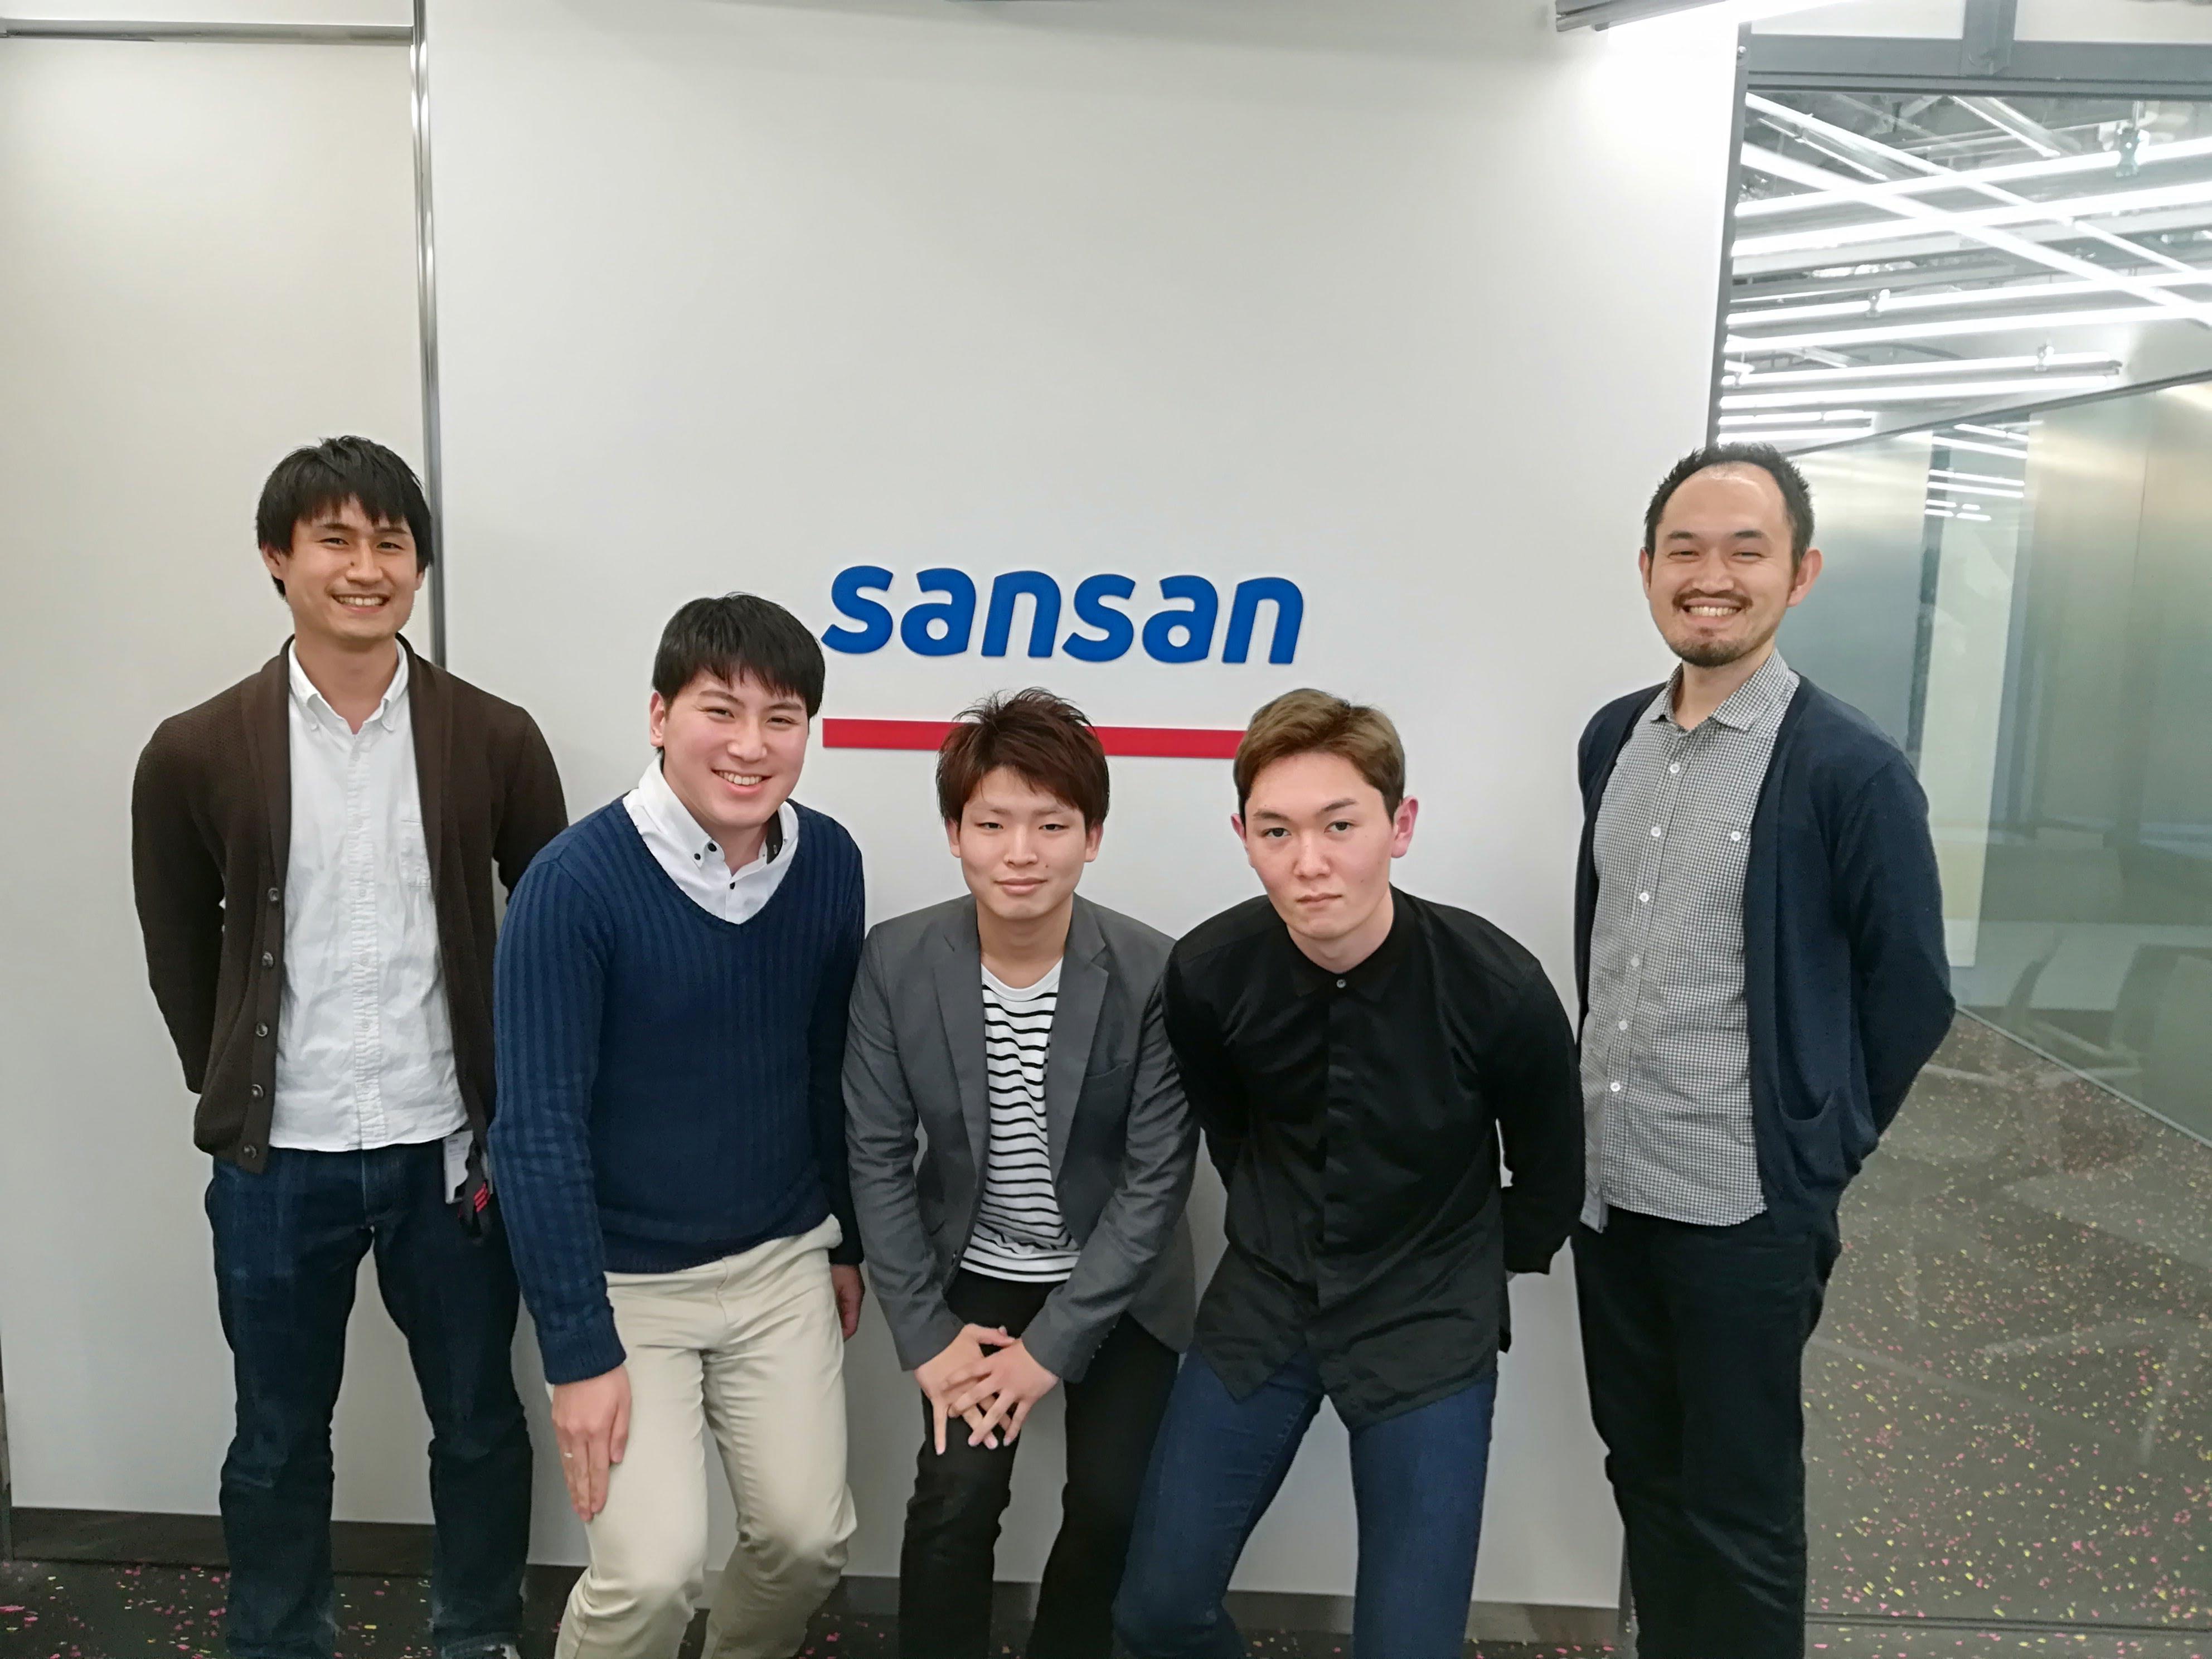 Sansan株式会社が取り組む、人の成長を促すコーチング制度  l Work Story Award 2017続編